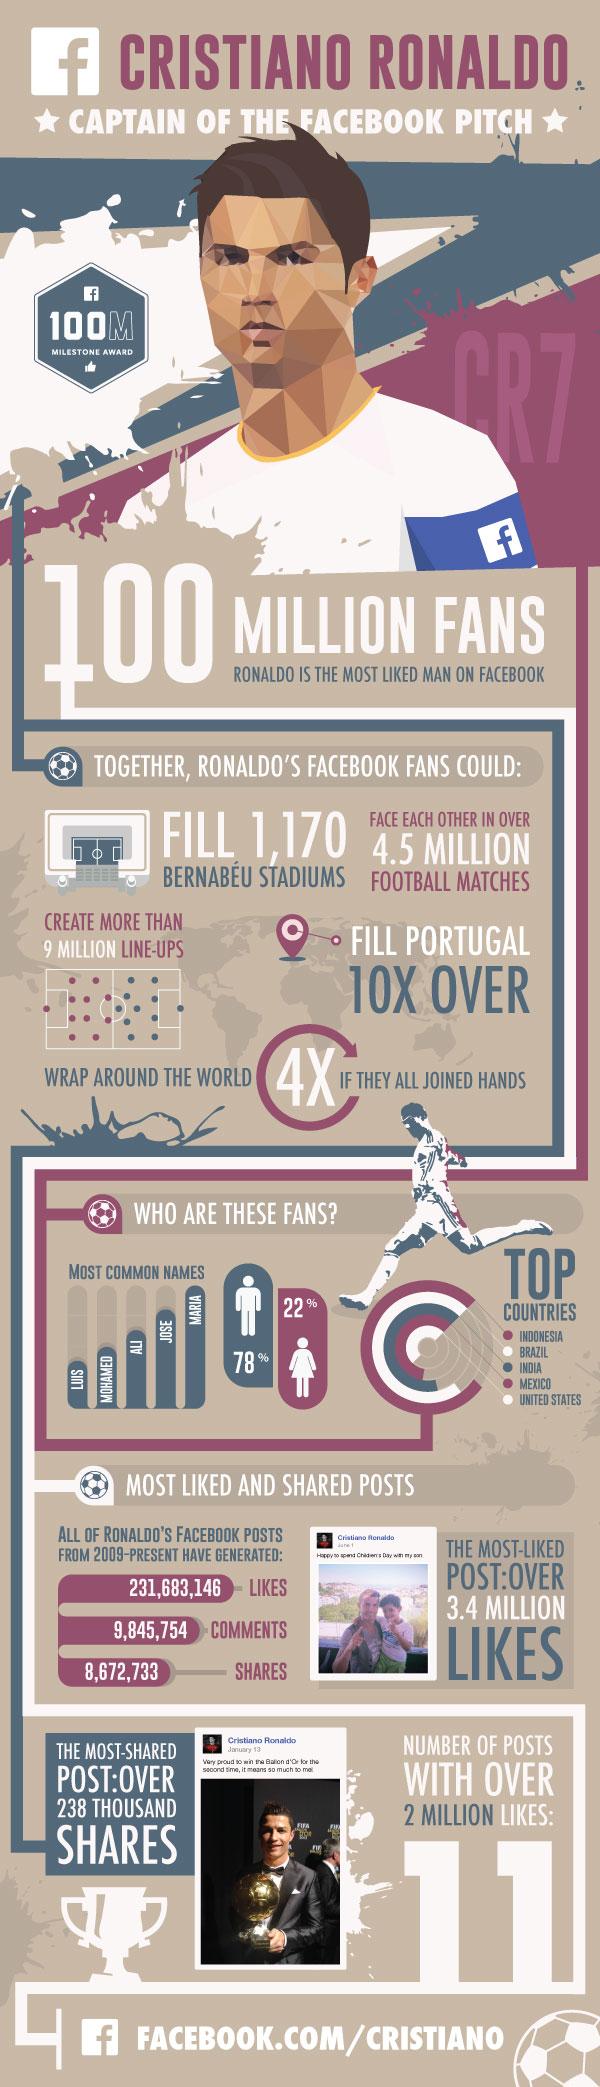 Cristiano Ronaldo 100 million Facebook likes